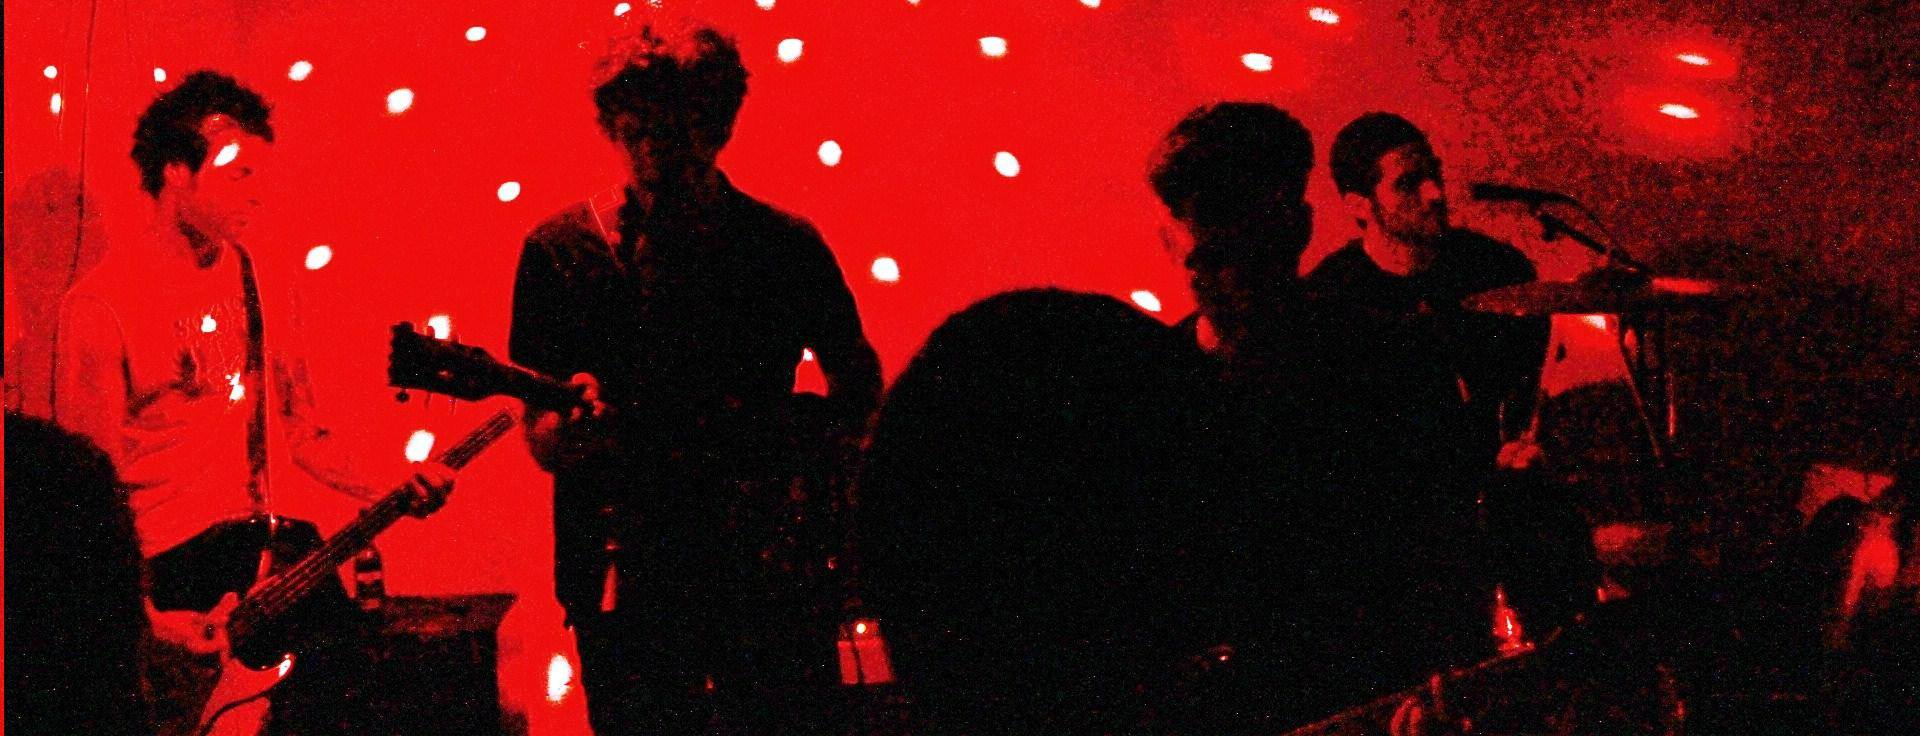 Banda Muerta reaparecen con Tigre Discs